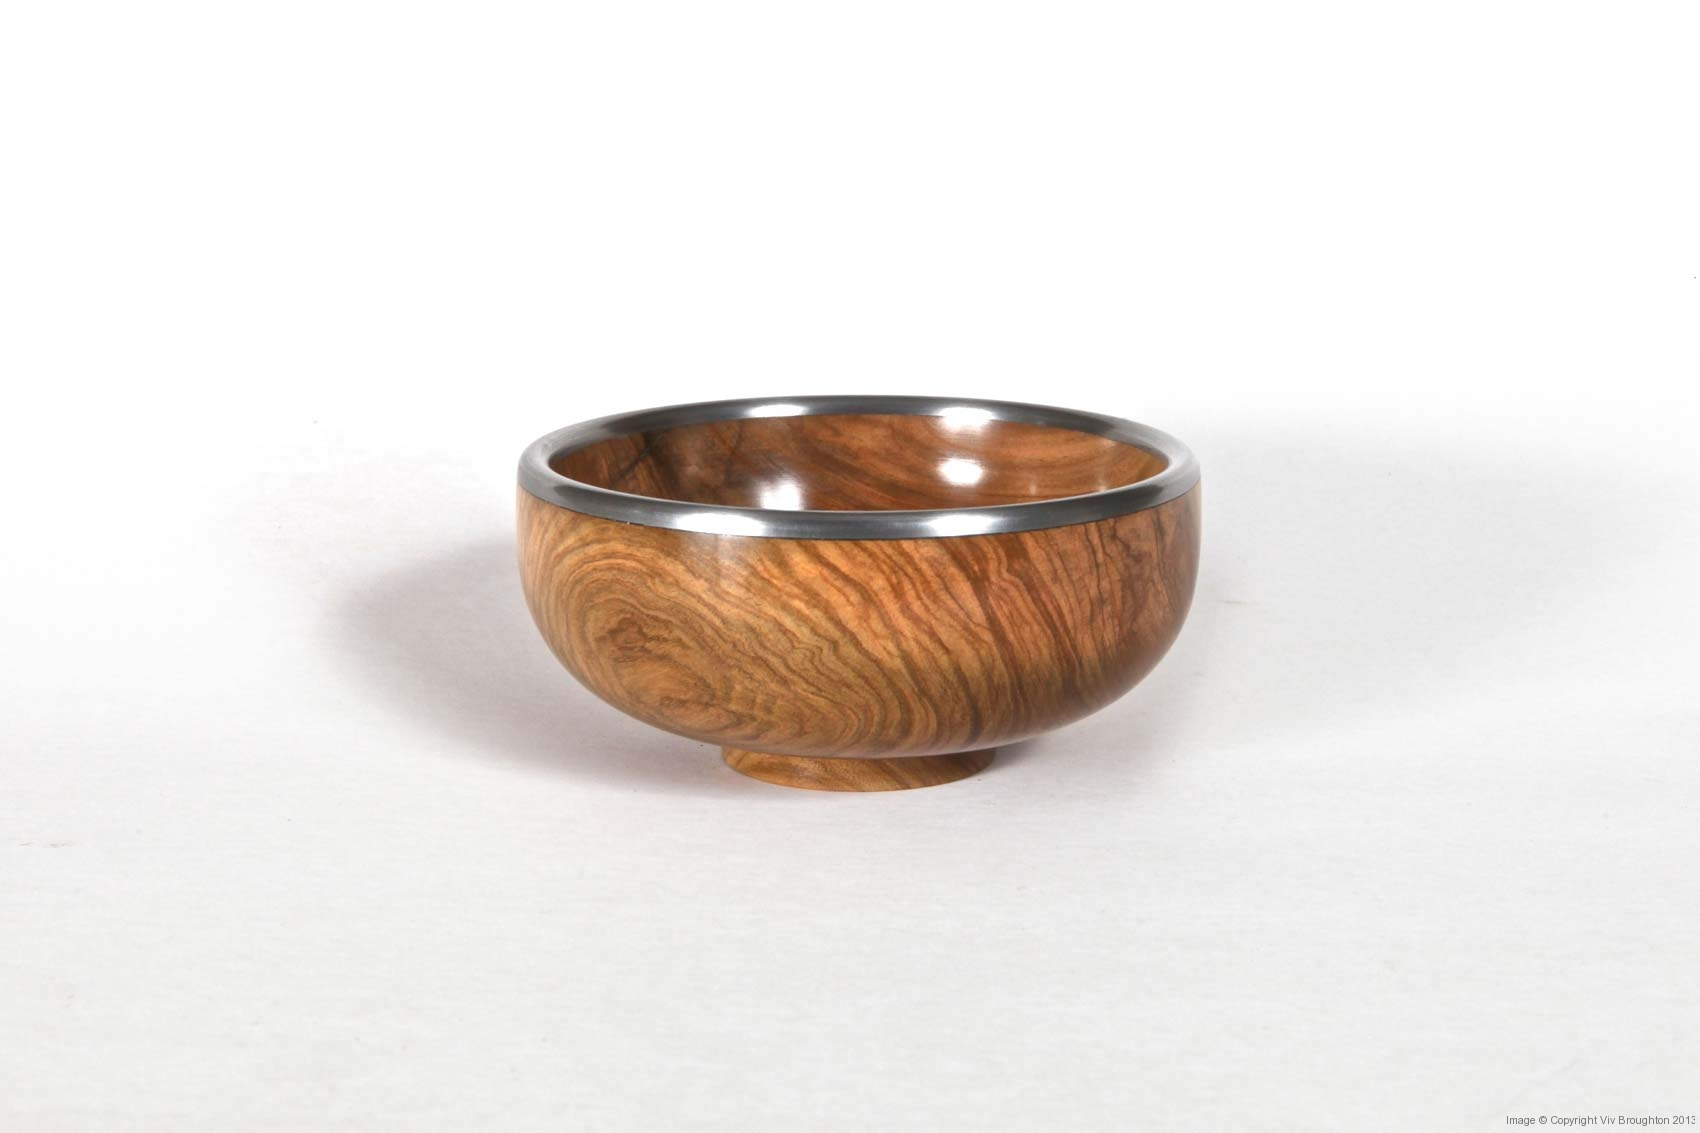 olive-bowl-plain-with-pewter-rim